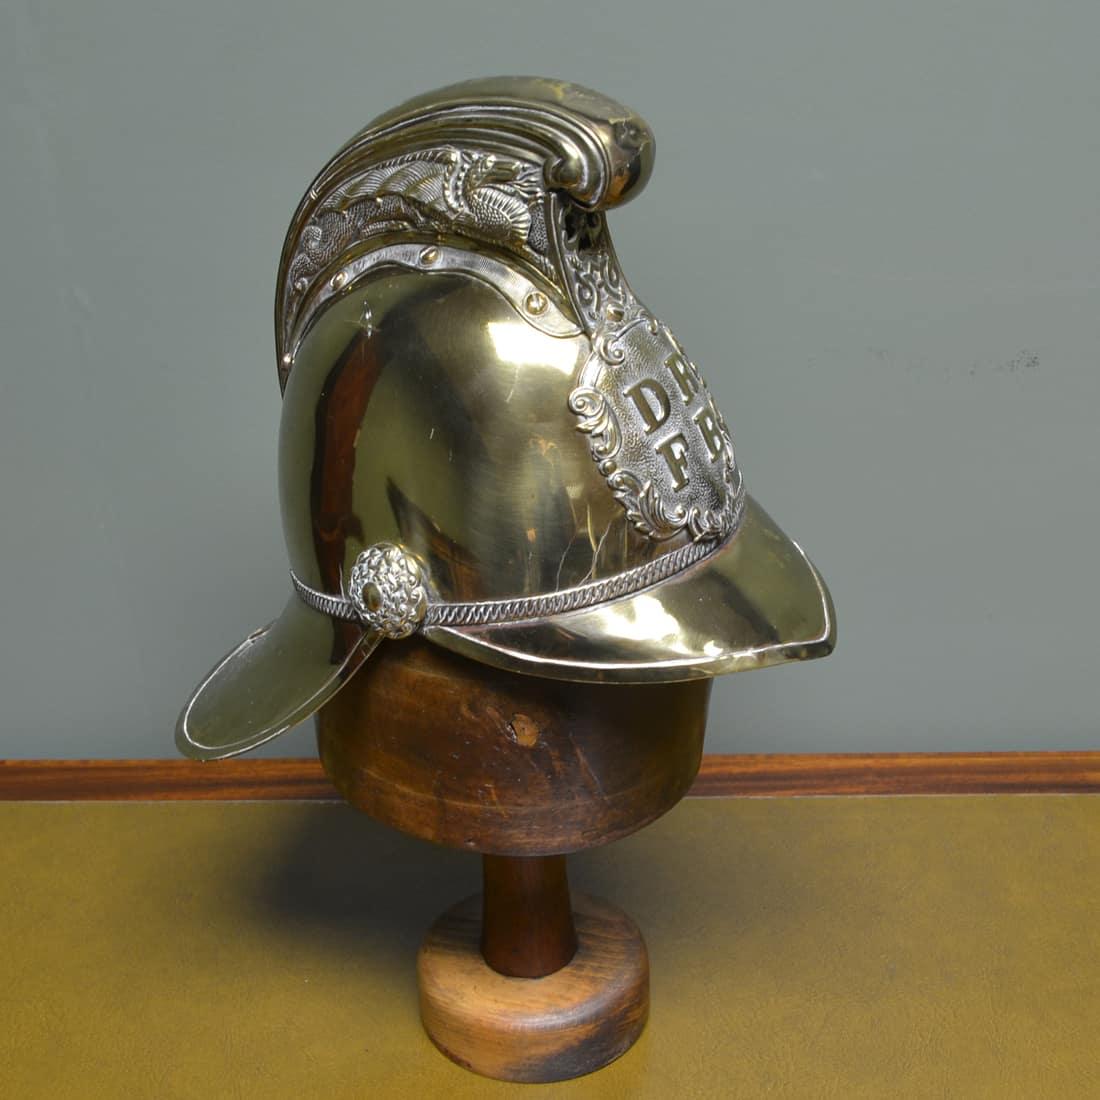 Original 19th Century Brass Decorative Antique Brass Fireman's Helmet